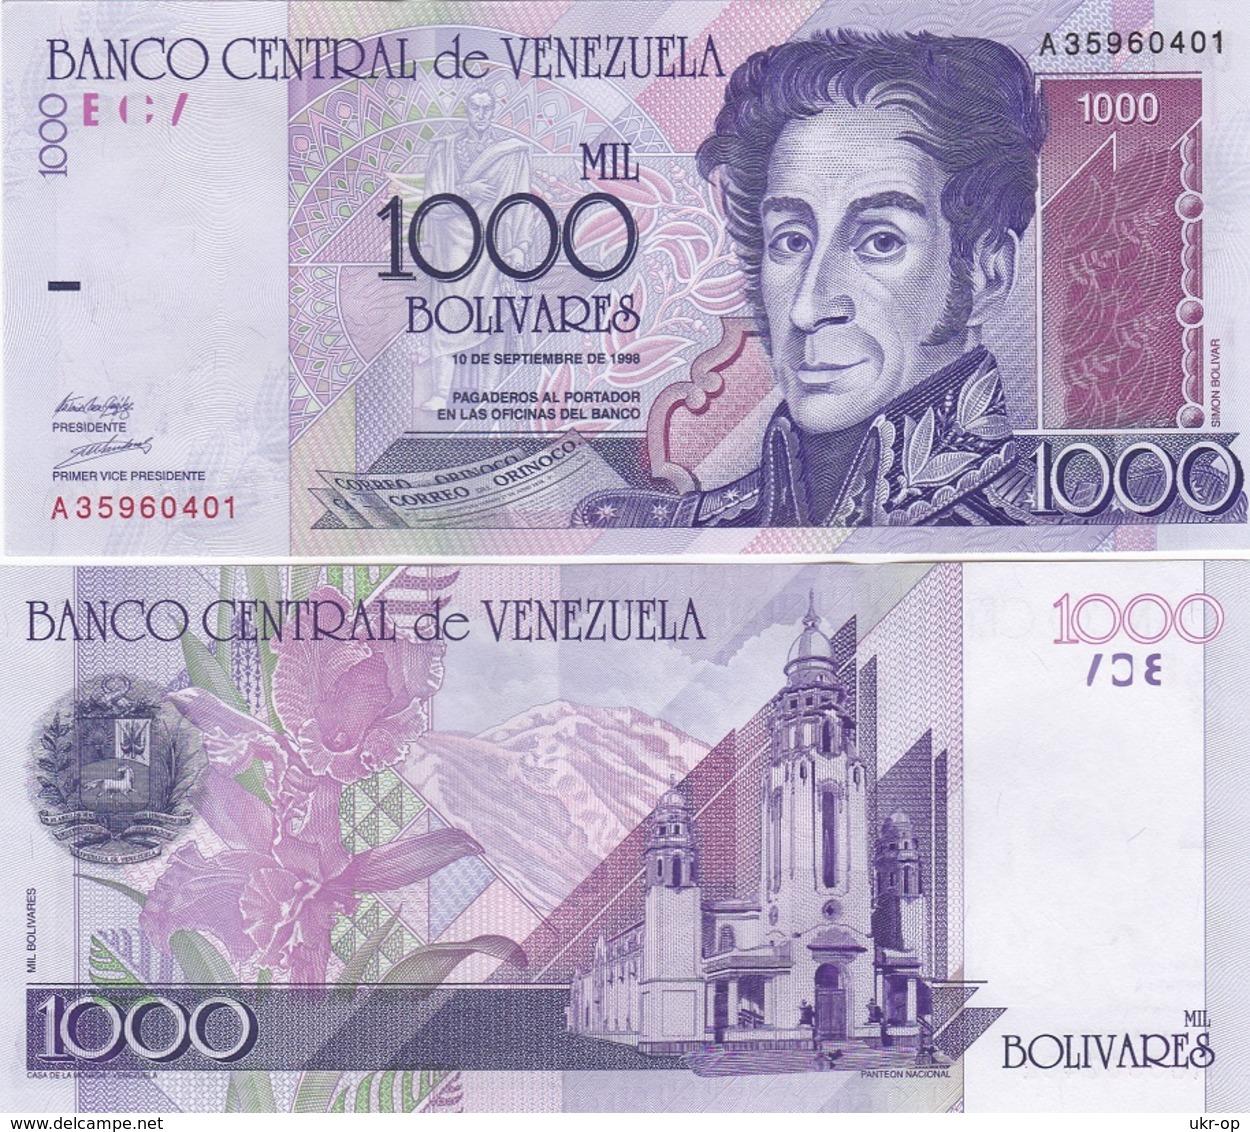 Venezuela - 1000 Bolivares 10.09. 1998 UNC Ukr-OP - Venezuela